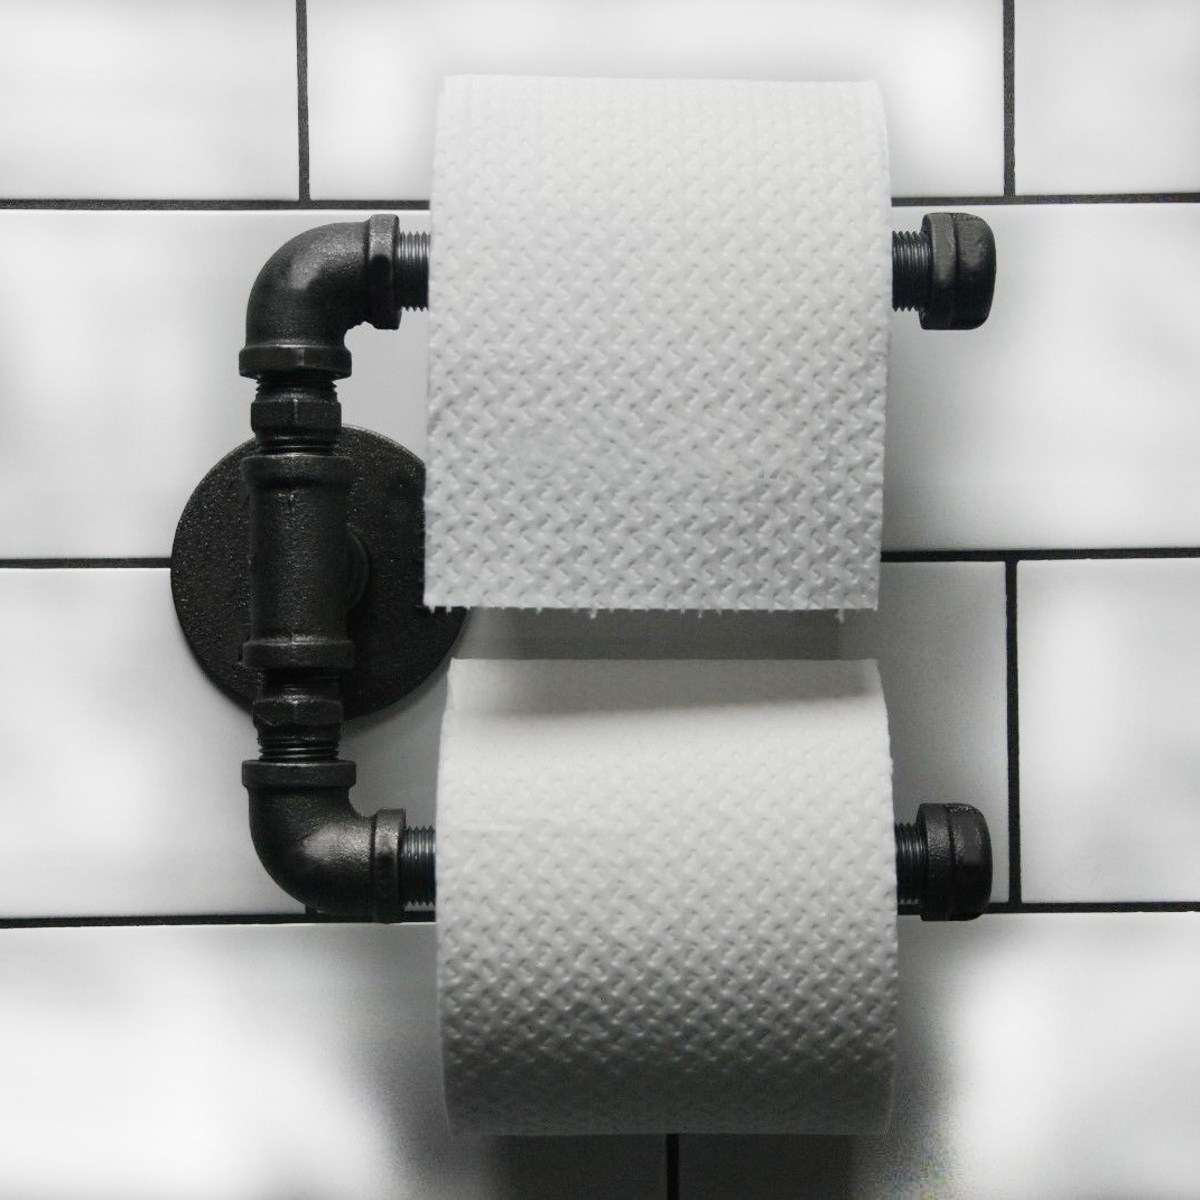 Urban Industrial Style Bathroom Paper Holder Hanger Tissue